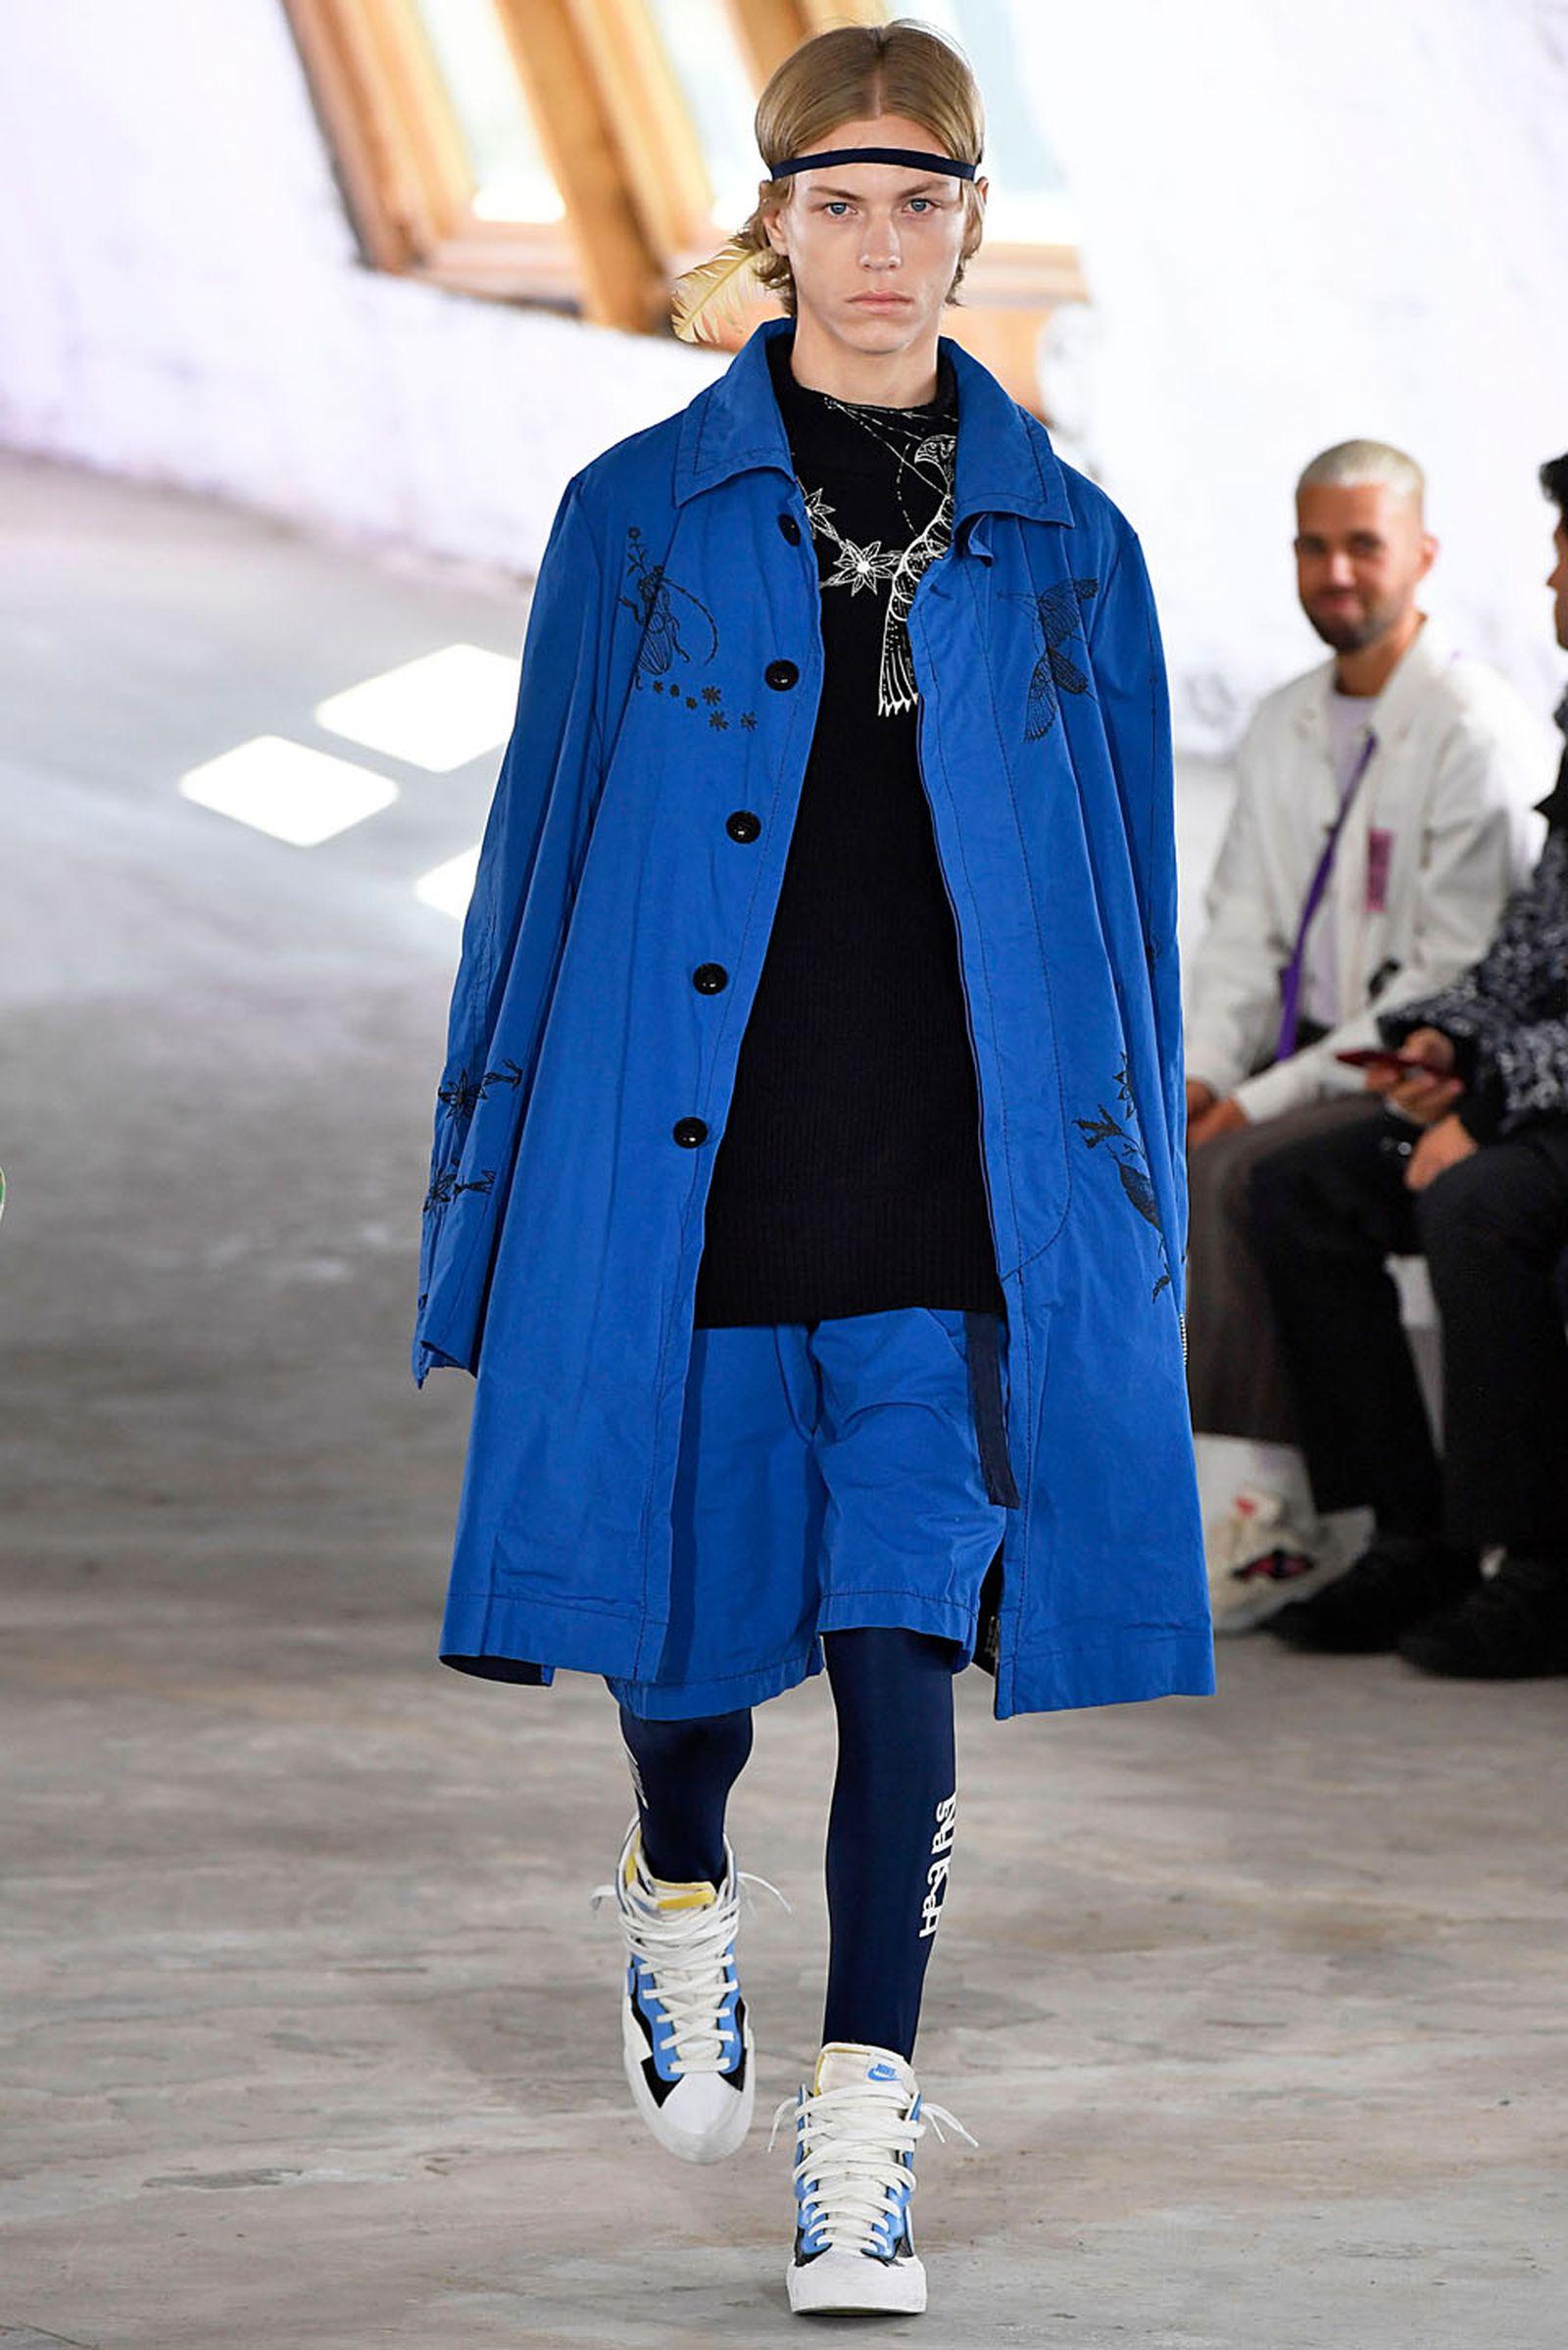 Sacai Paris Menswear Spring Summer 2019 Paris June 2018 PFW18 Spring/Summer 2019 chitose abe